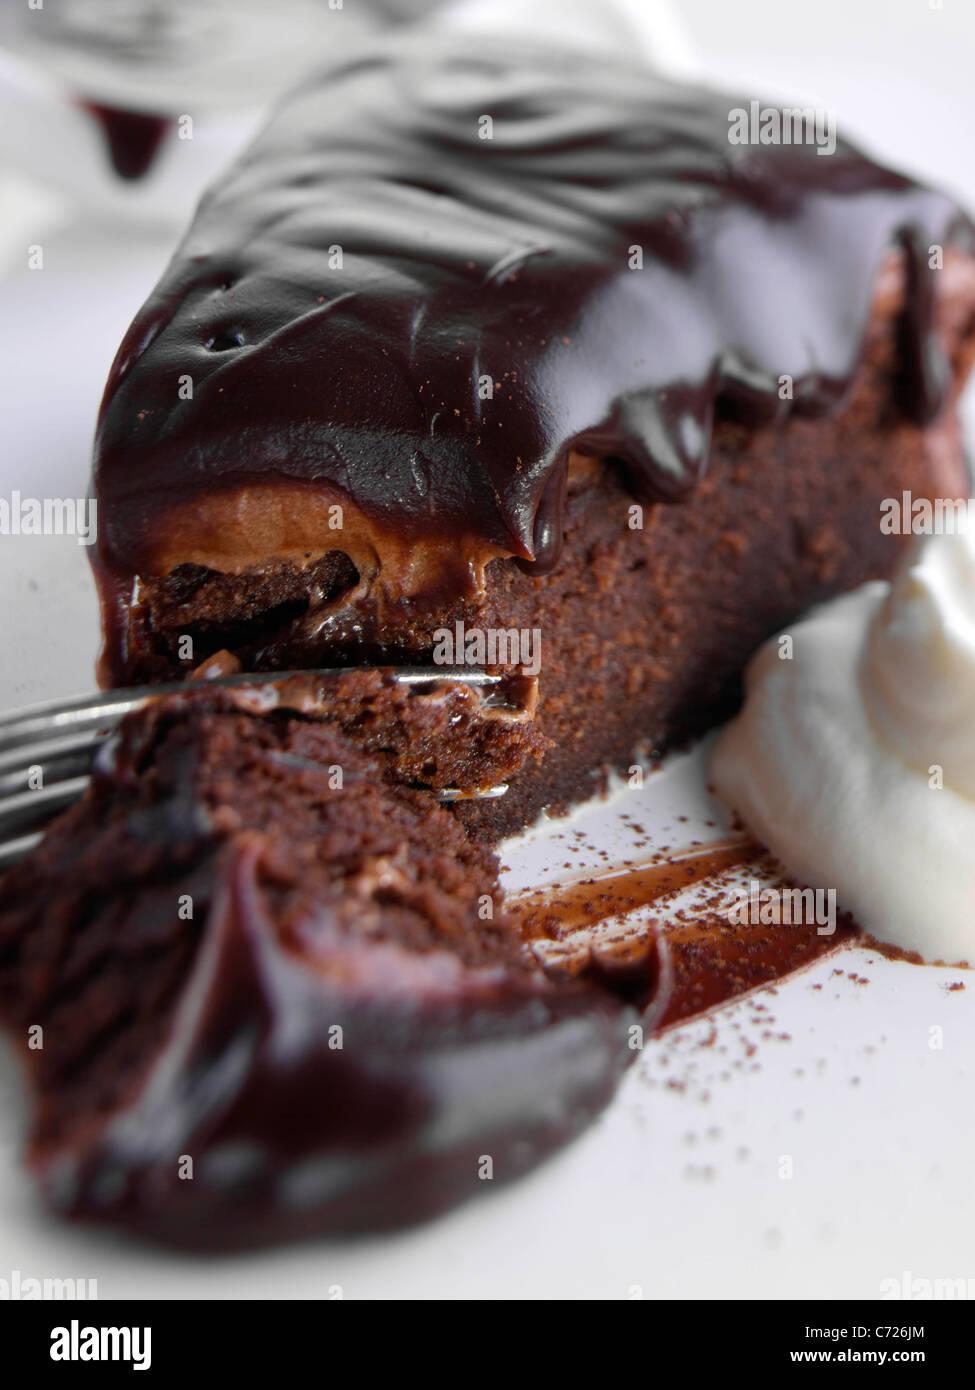 Chocolate Fudge Cake Stock Photos & Chocolate Fudge Cake Stock ...